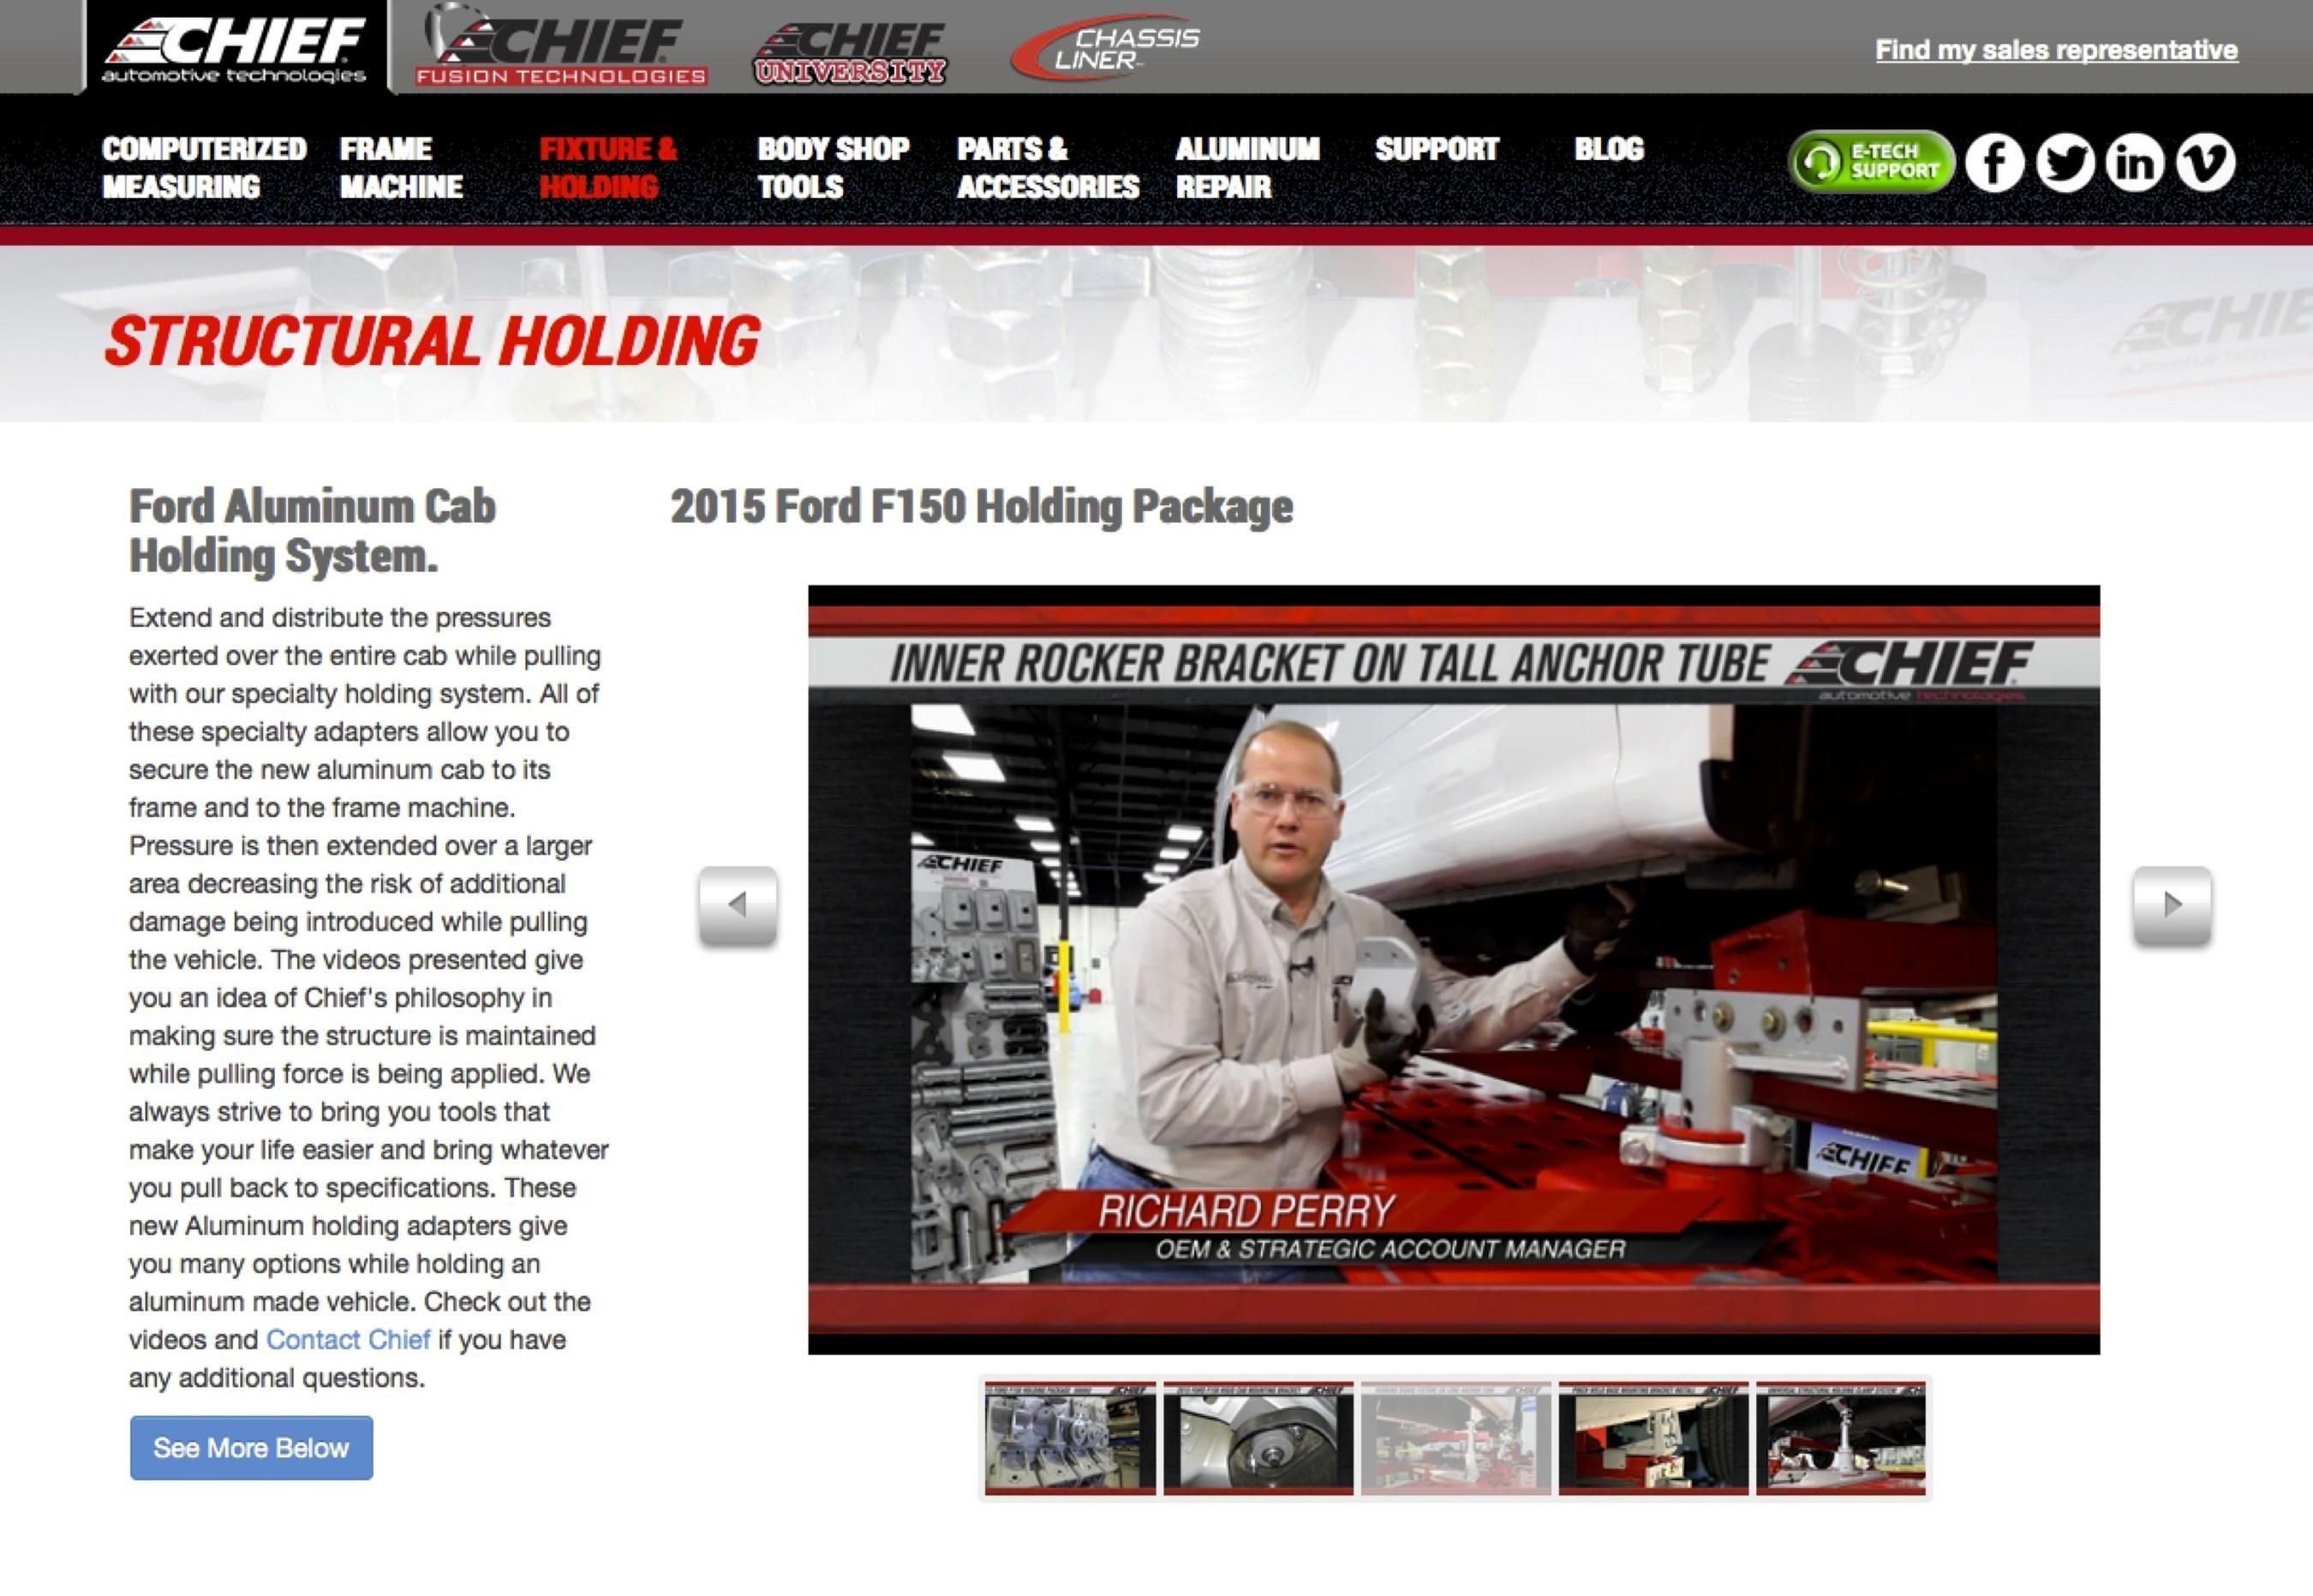 New Chief Videos Teach Proper 2015 Ford F-150 Anchoring